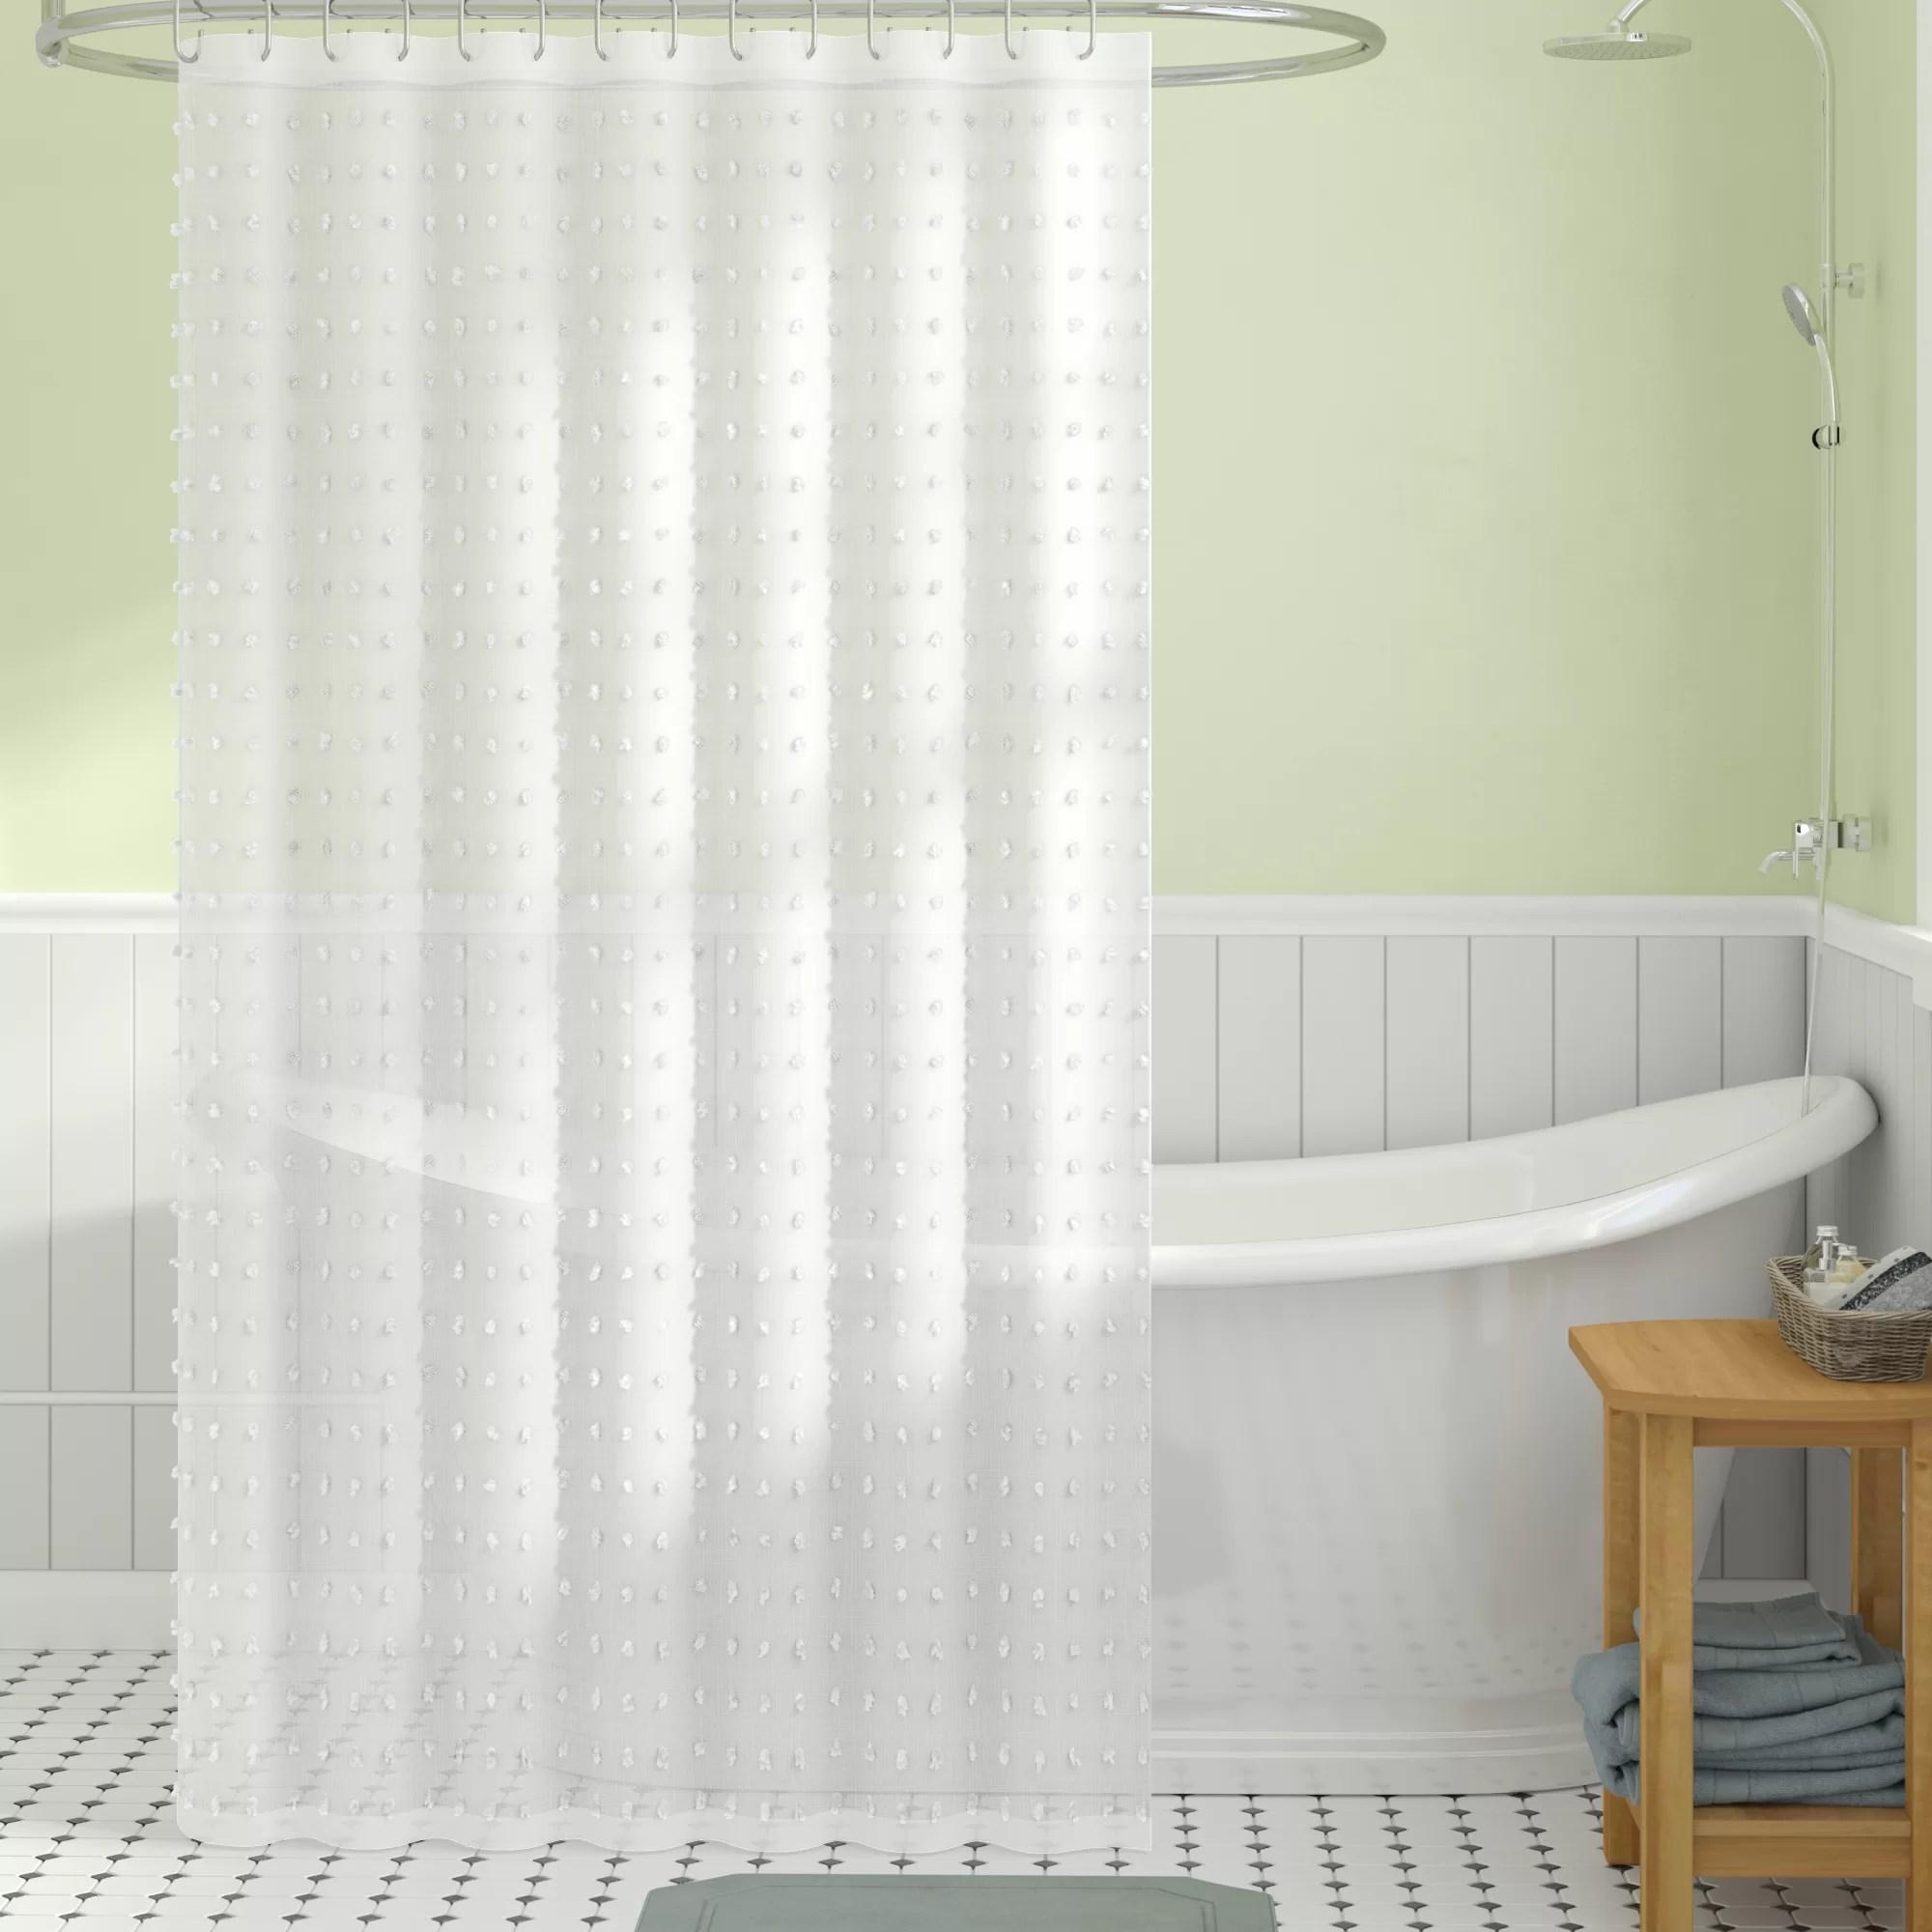 abrahams cut flower linen look fabric single shower curtain